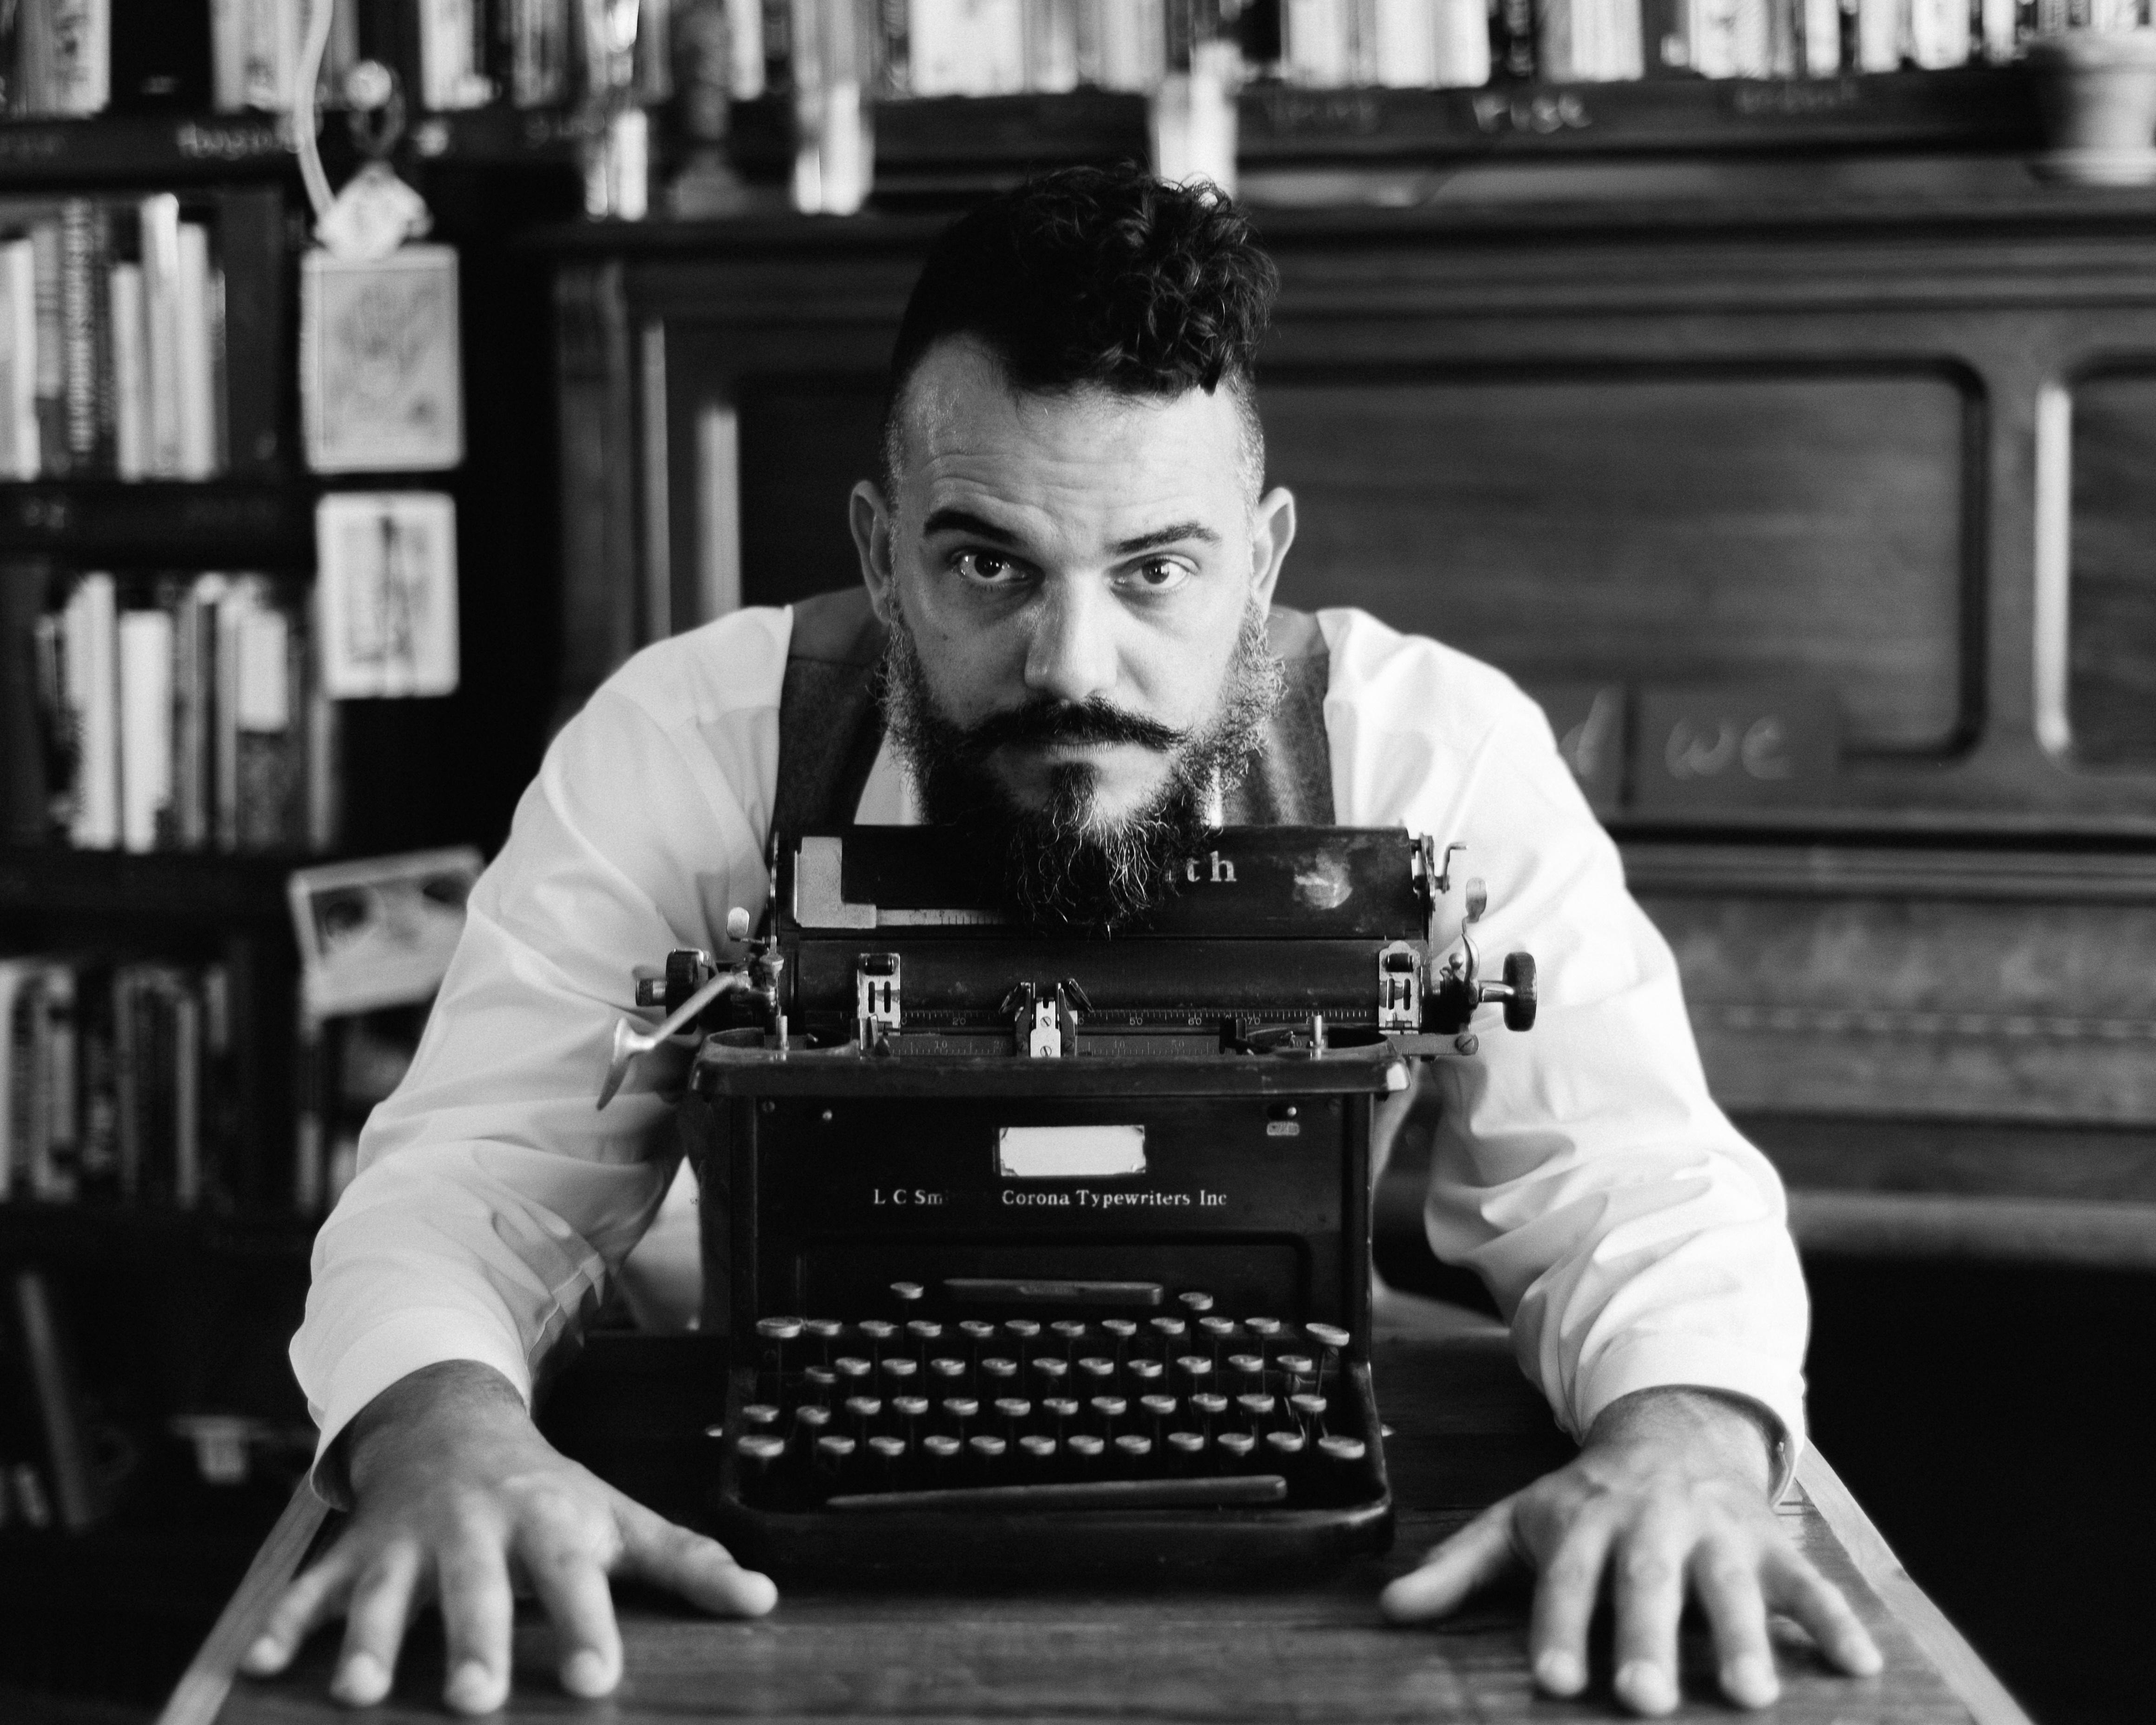 JK Fowler of Nomadic Press